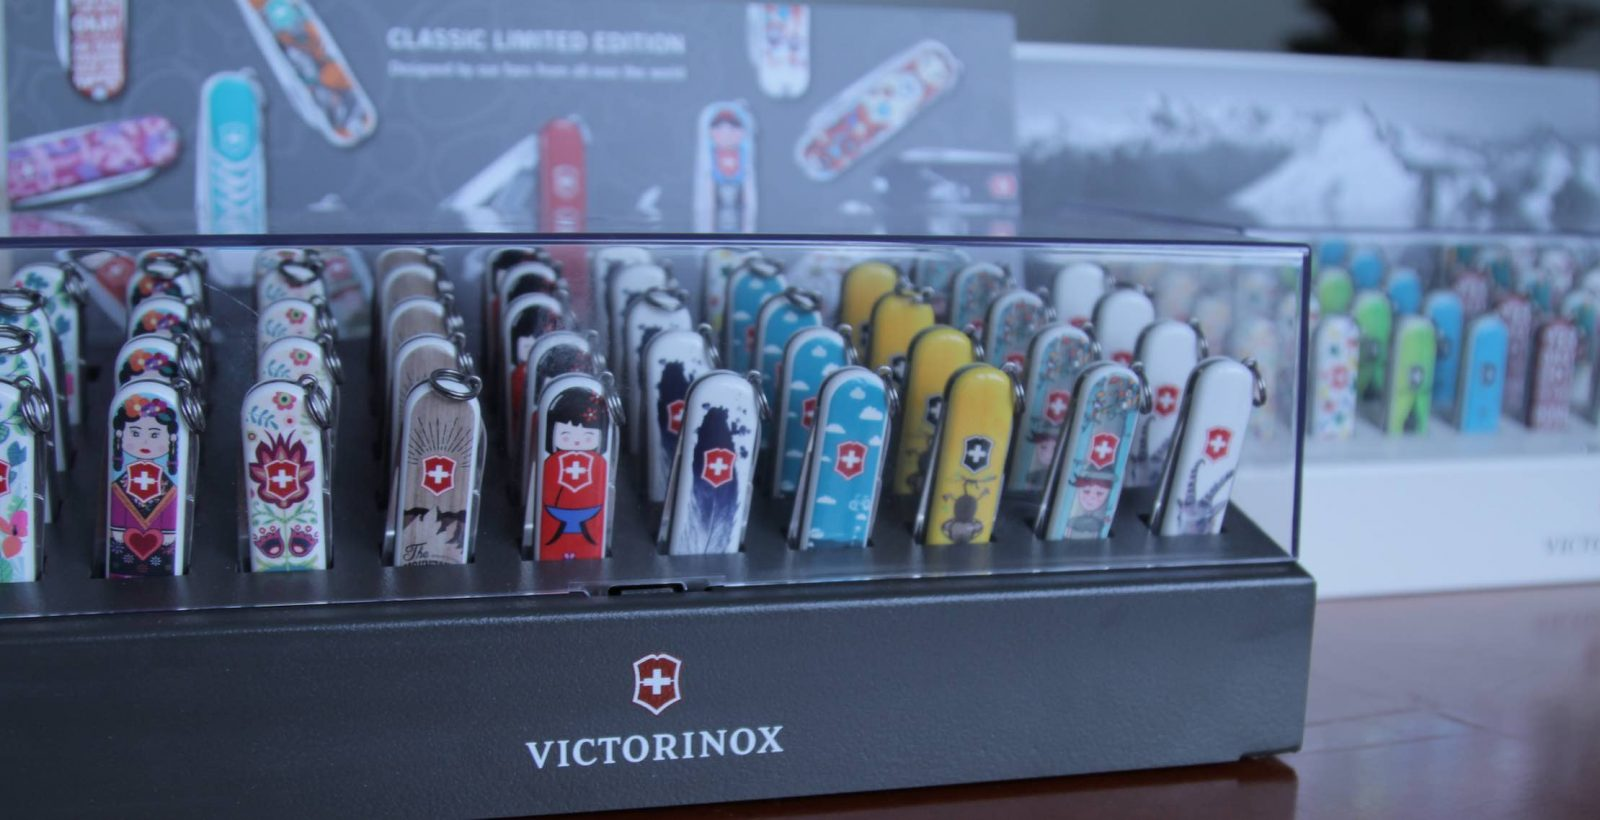 Victorinox Swiss Army Knife design challenge